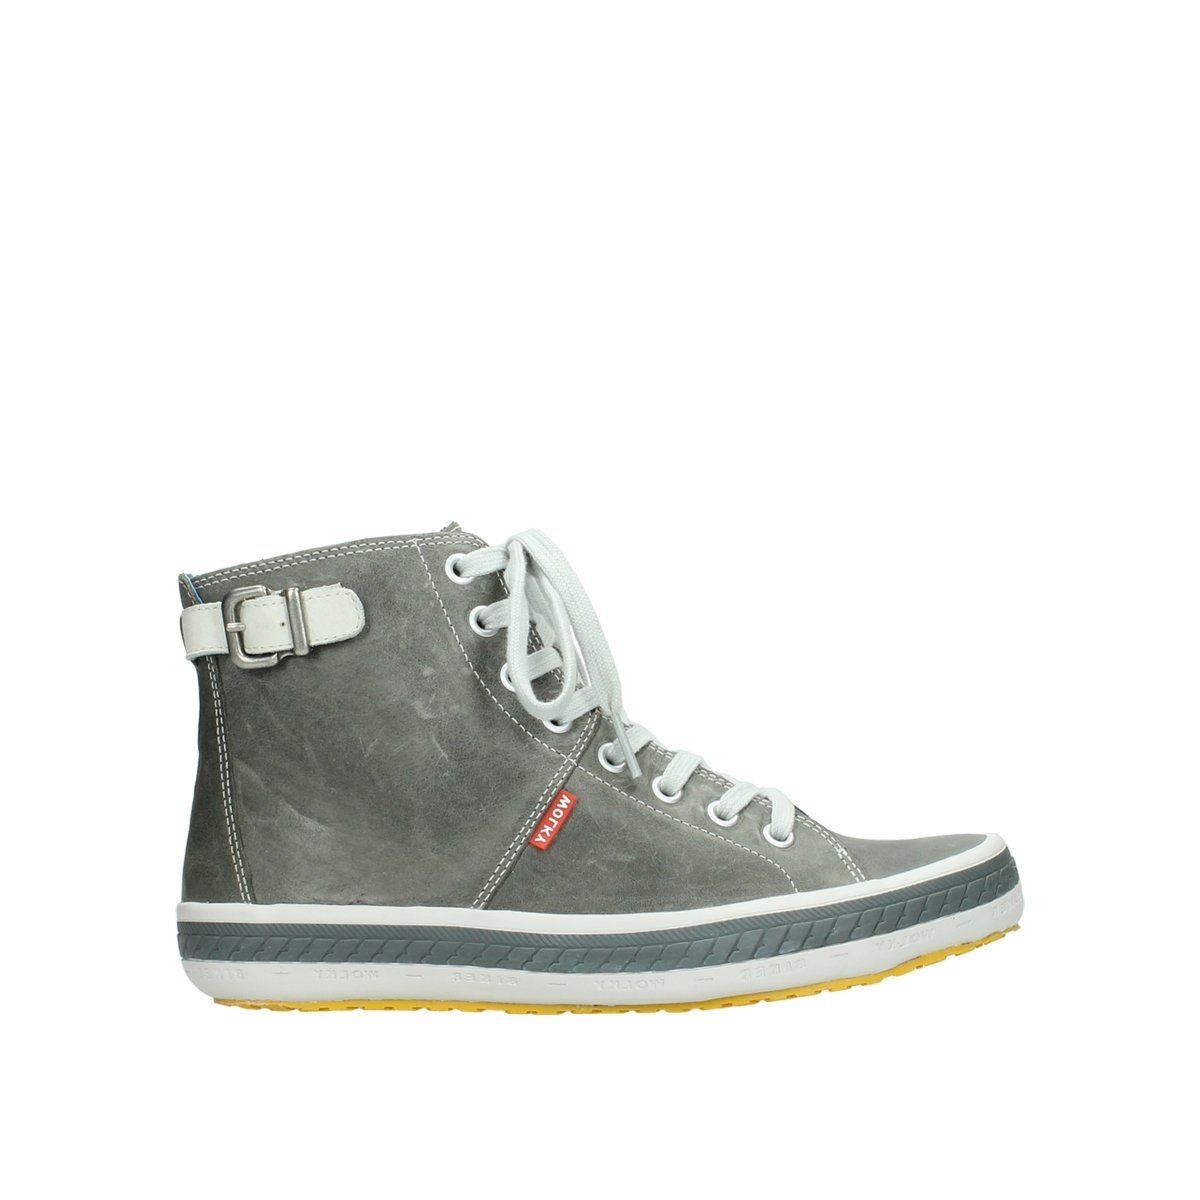 Wolky 1176411 - Sandalias de vestir para mujer 30200 Grey Leather